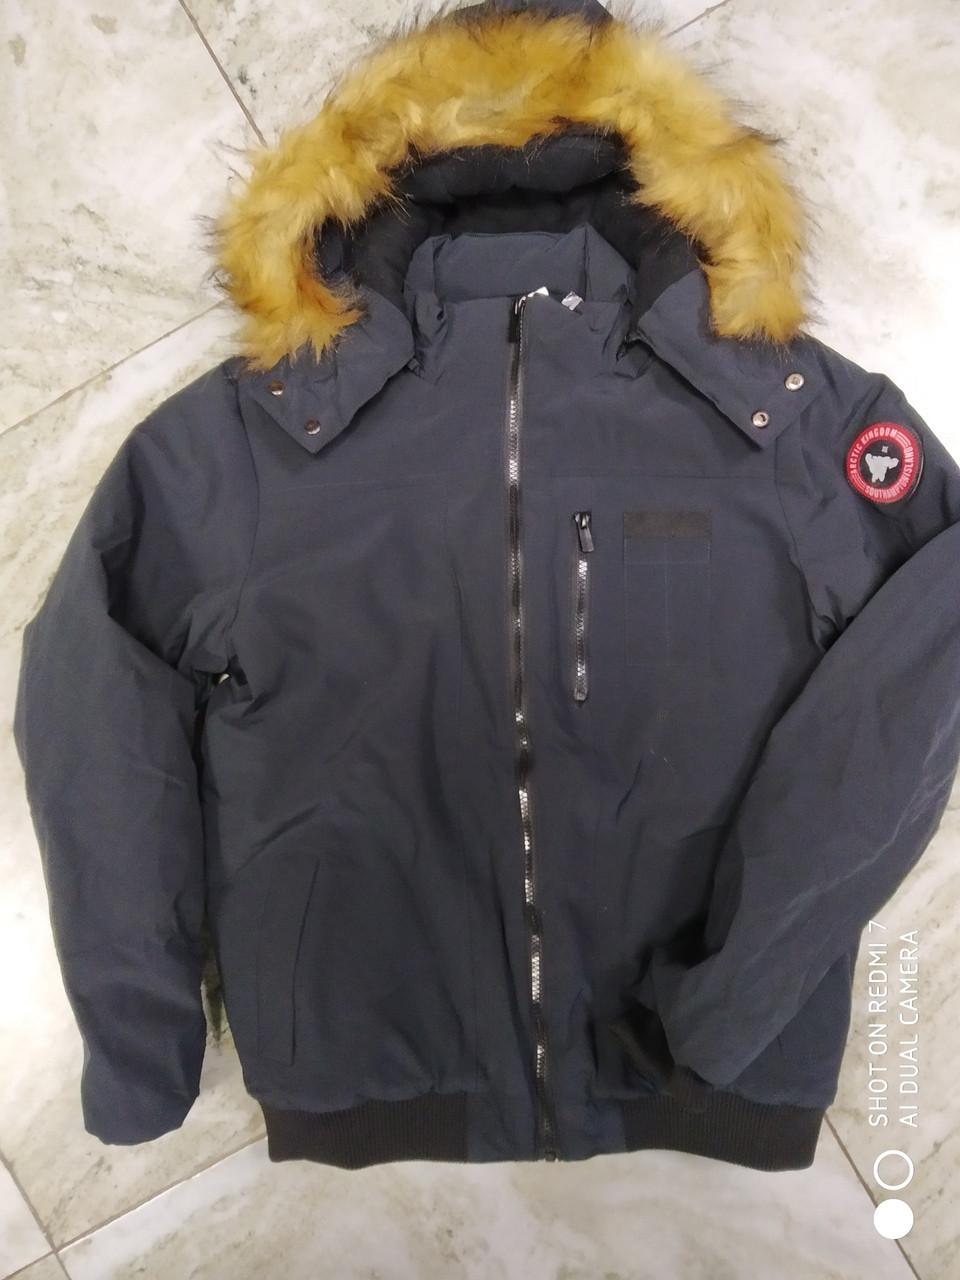 Зимняя куртка Бомбер  на мальчика  170 см